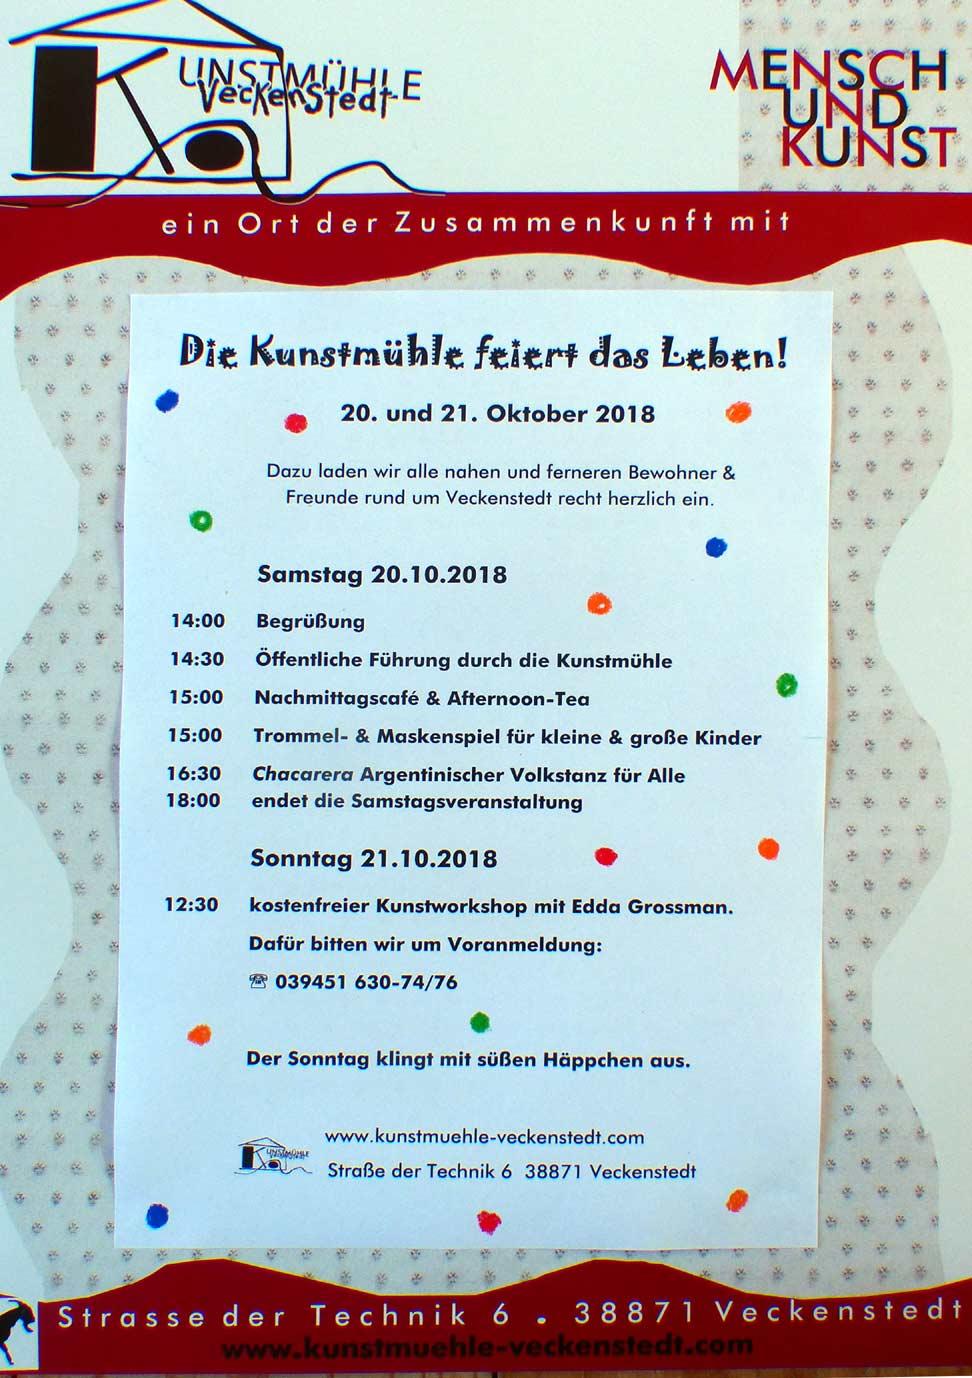 KunstmühlenfestAblauf-72